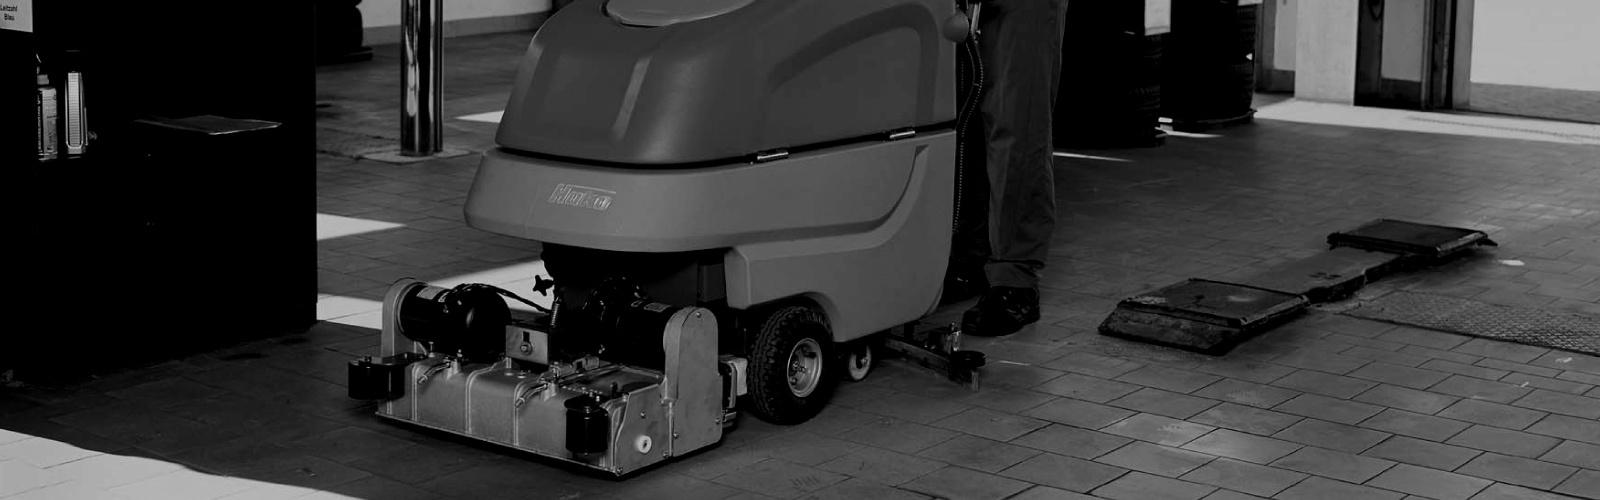 Scrubmaster B70 CL Industrial Battery Electric Floor Scrubber - 65cm-85cm